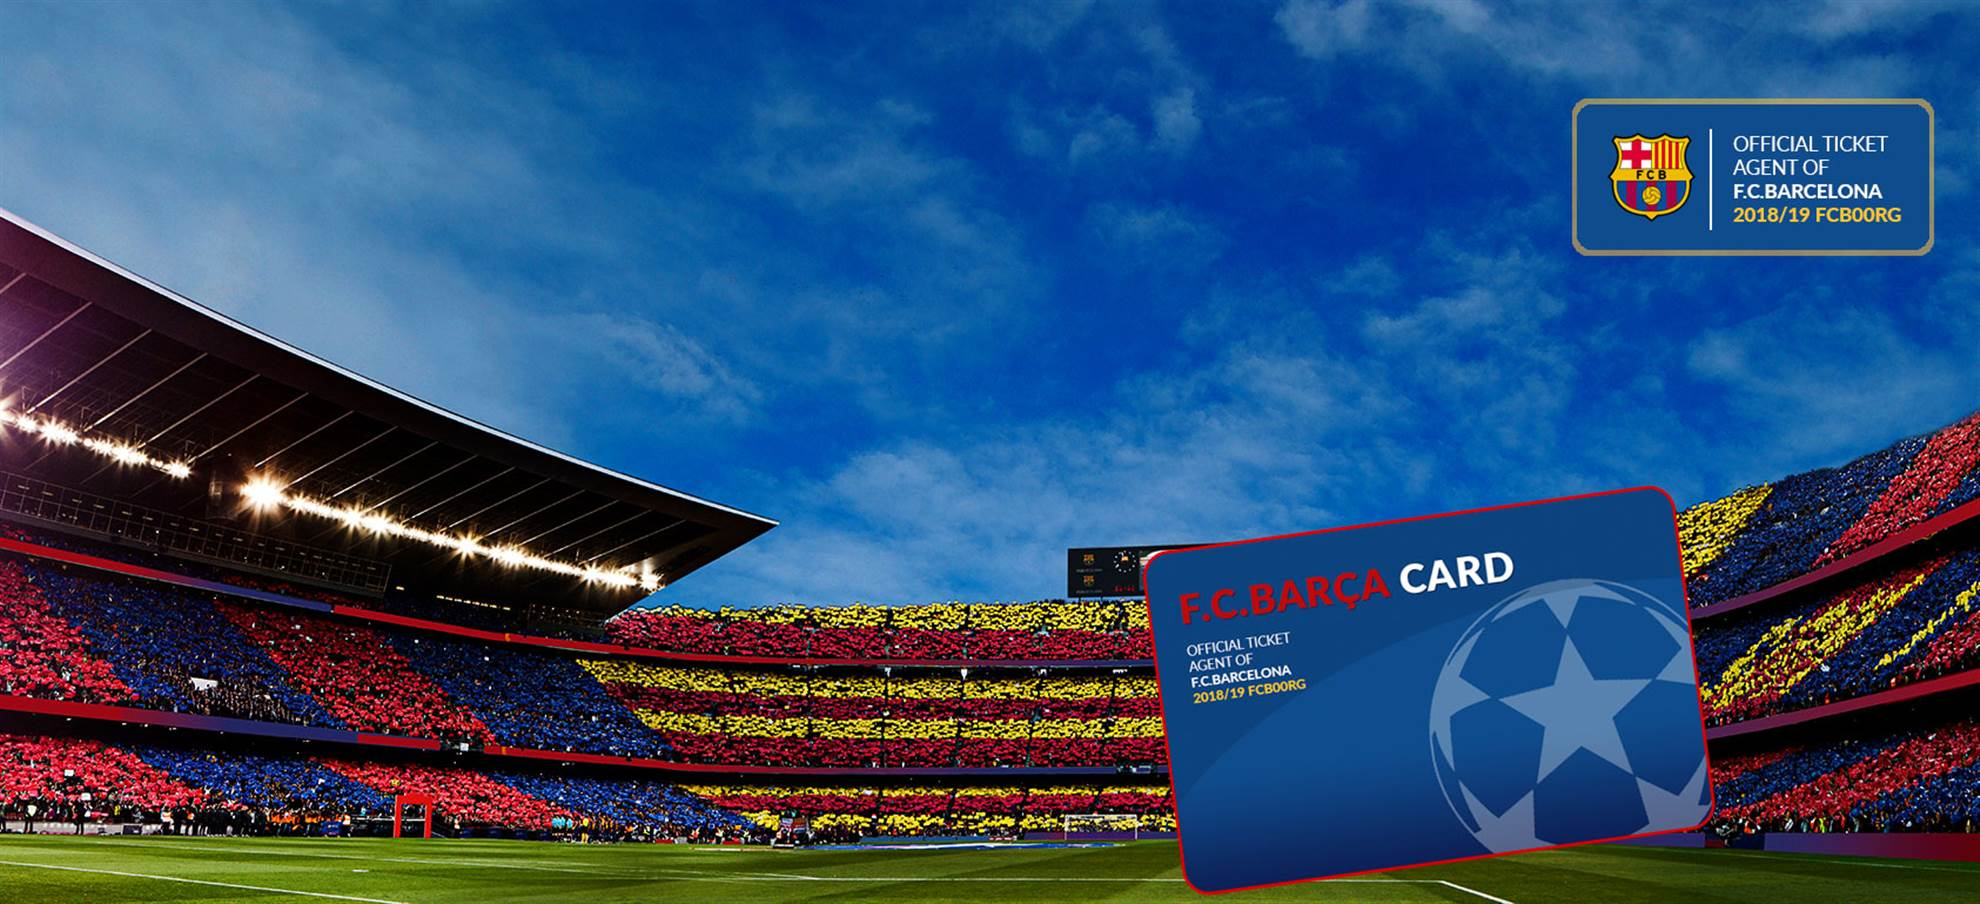 FC BARÇA CARD